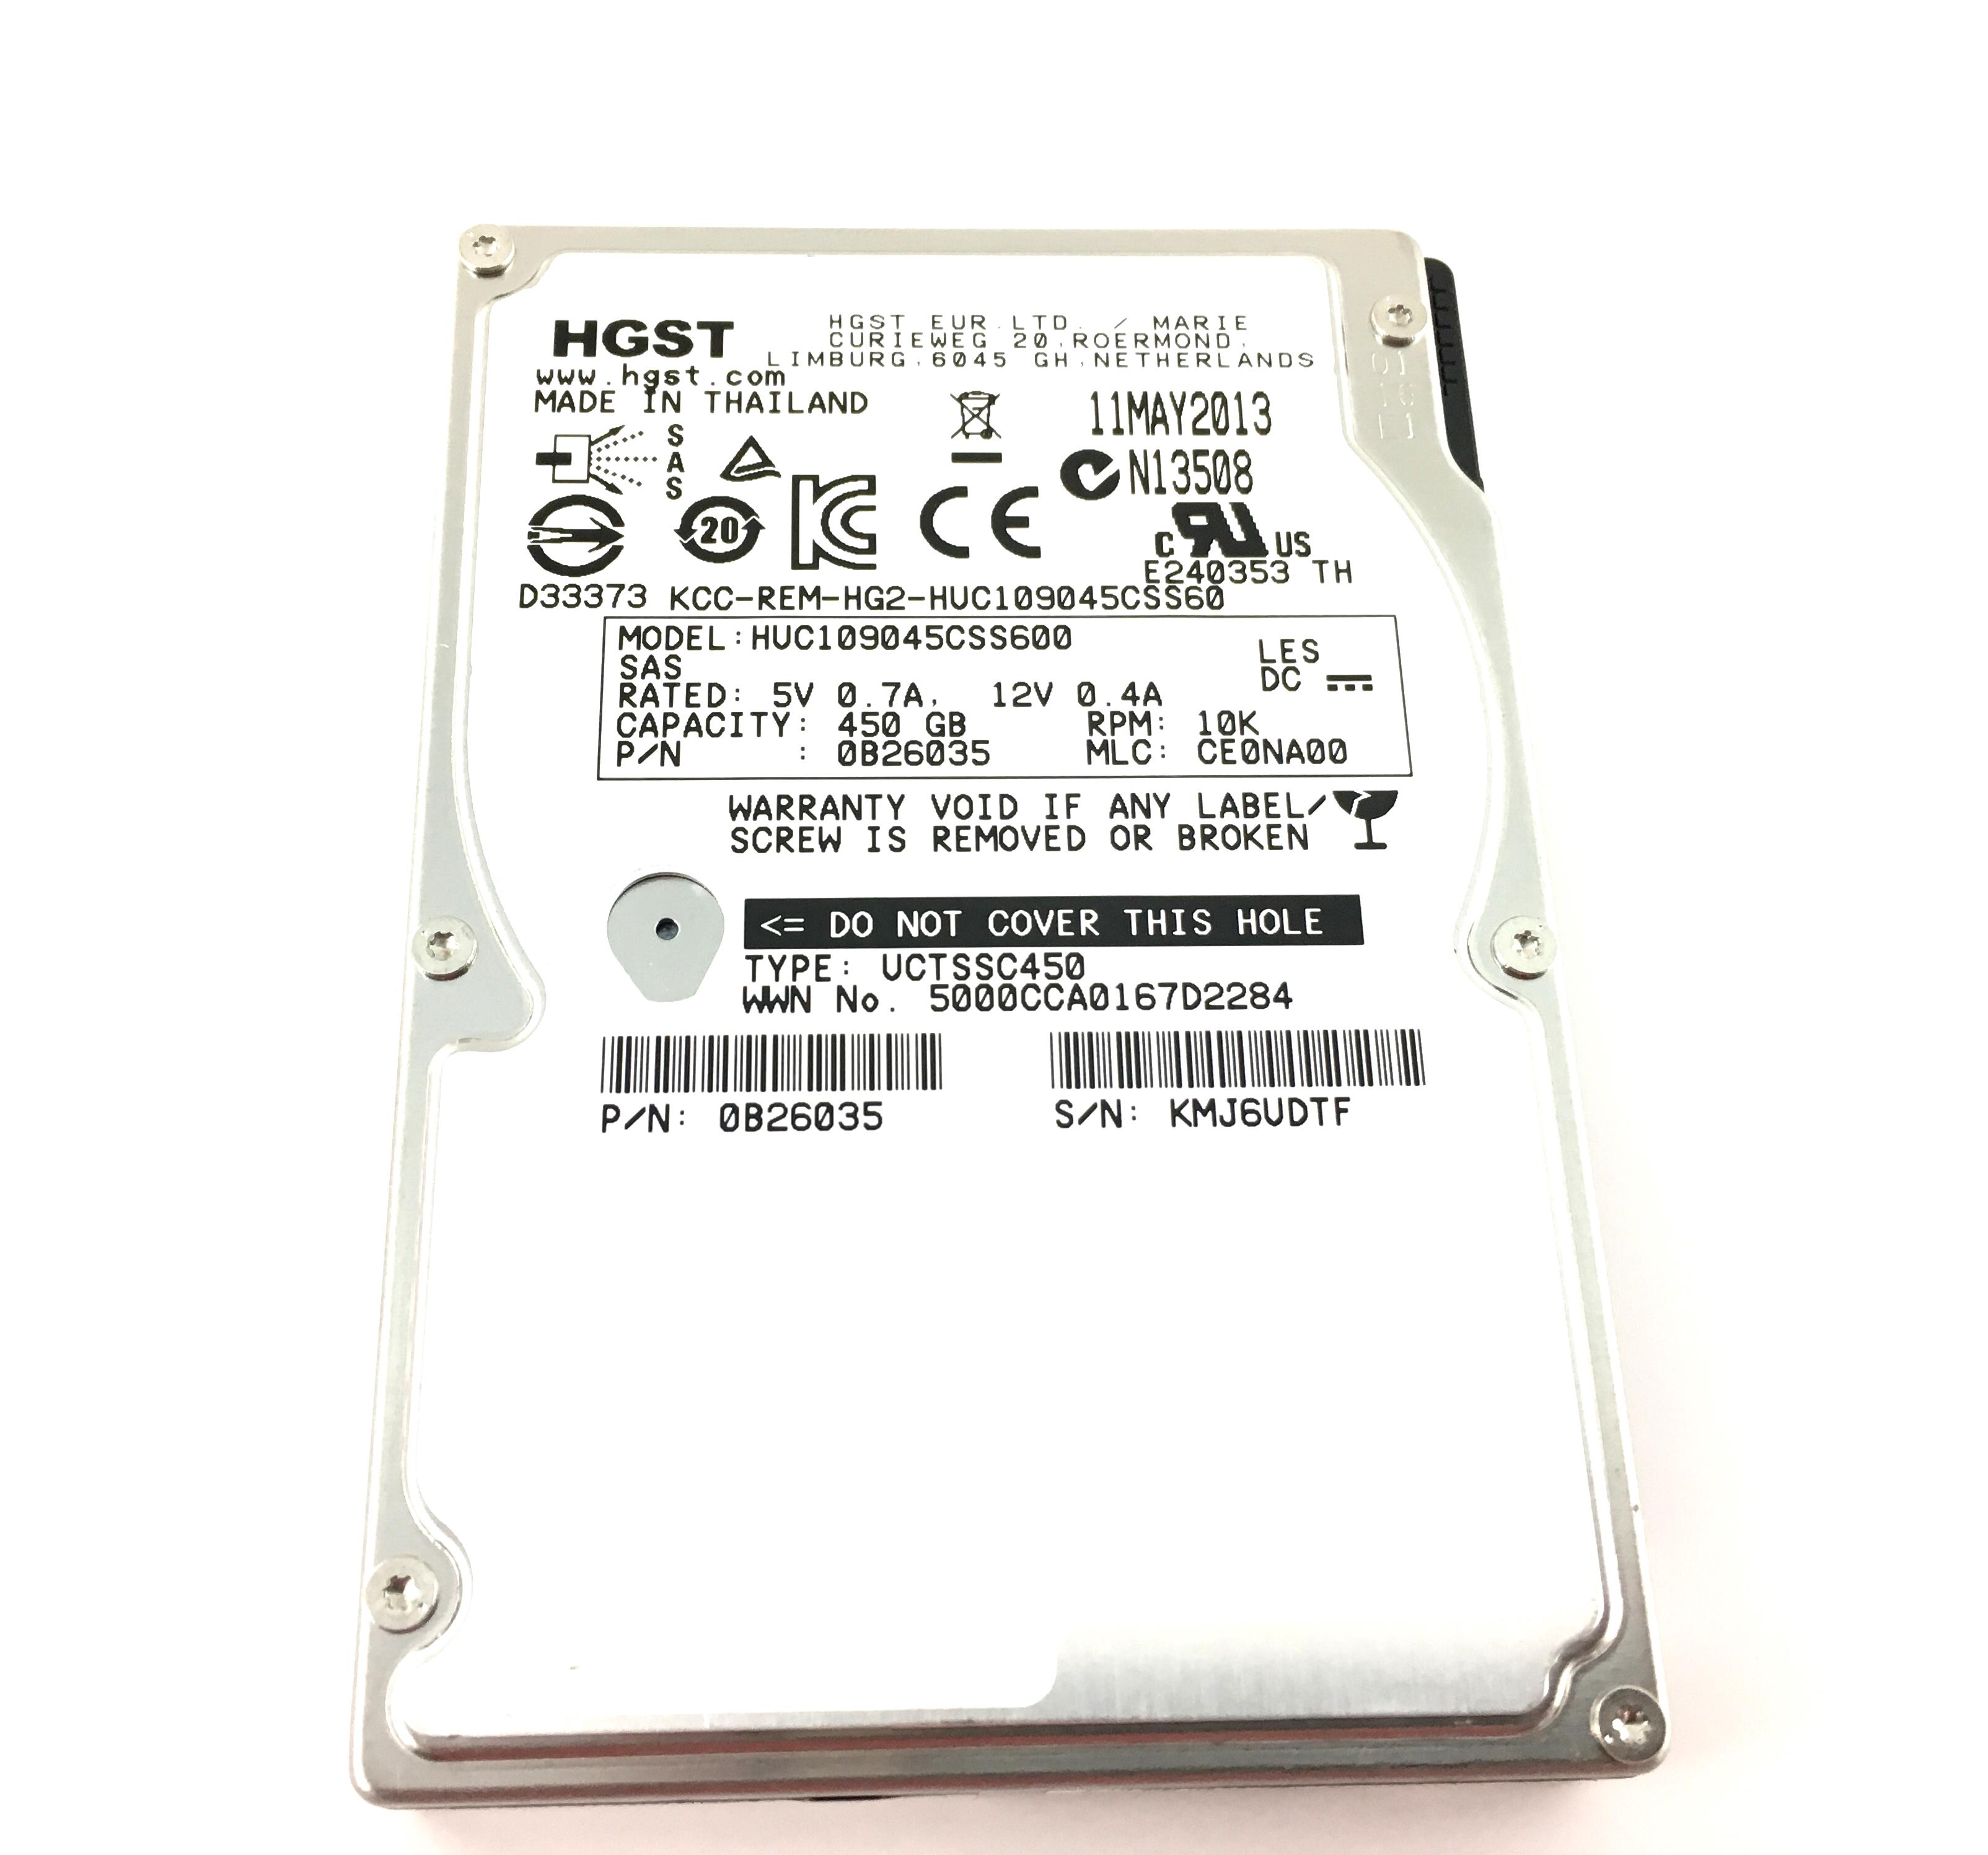 Hitachi 450GB 10K 6Gbps SAS 2.5'' Hard Drive (HUC109045CSS600)